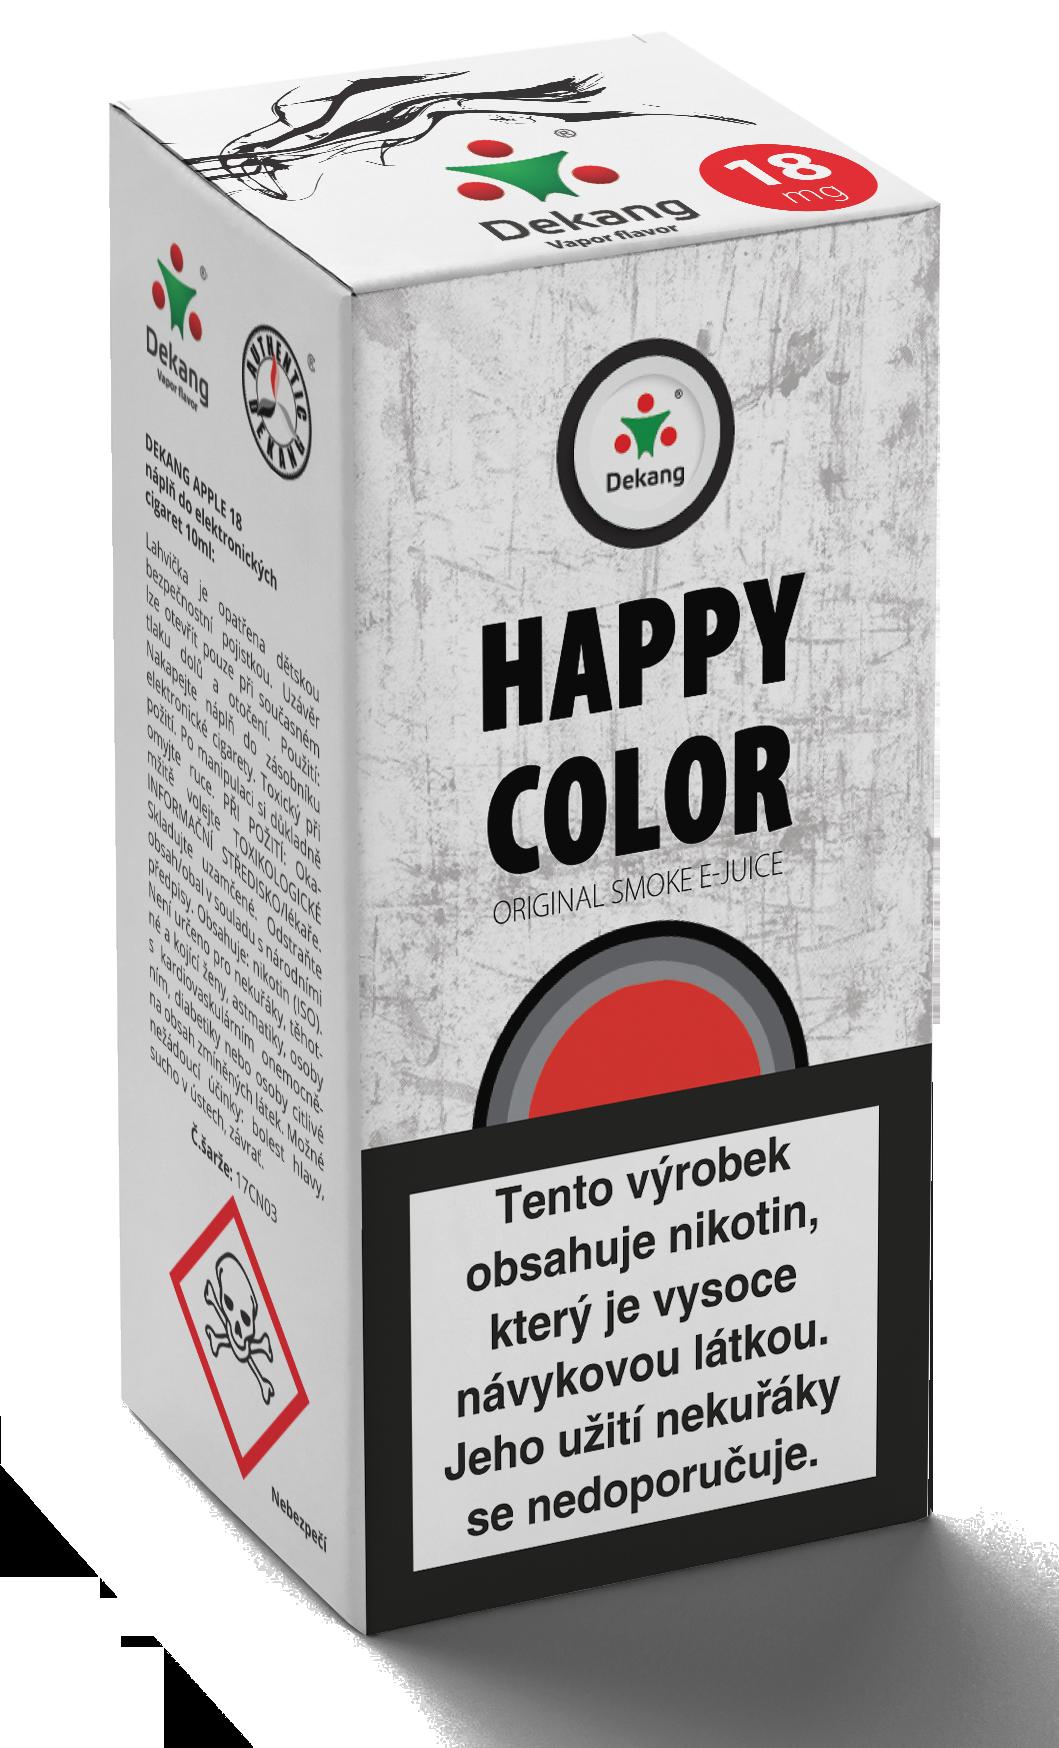 E-liquid Dekang 10ml Happy color Množství nikotinu: 0mg